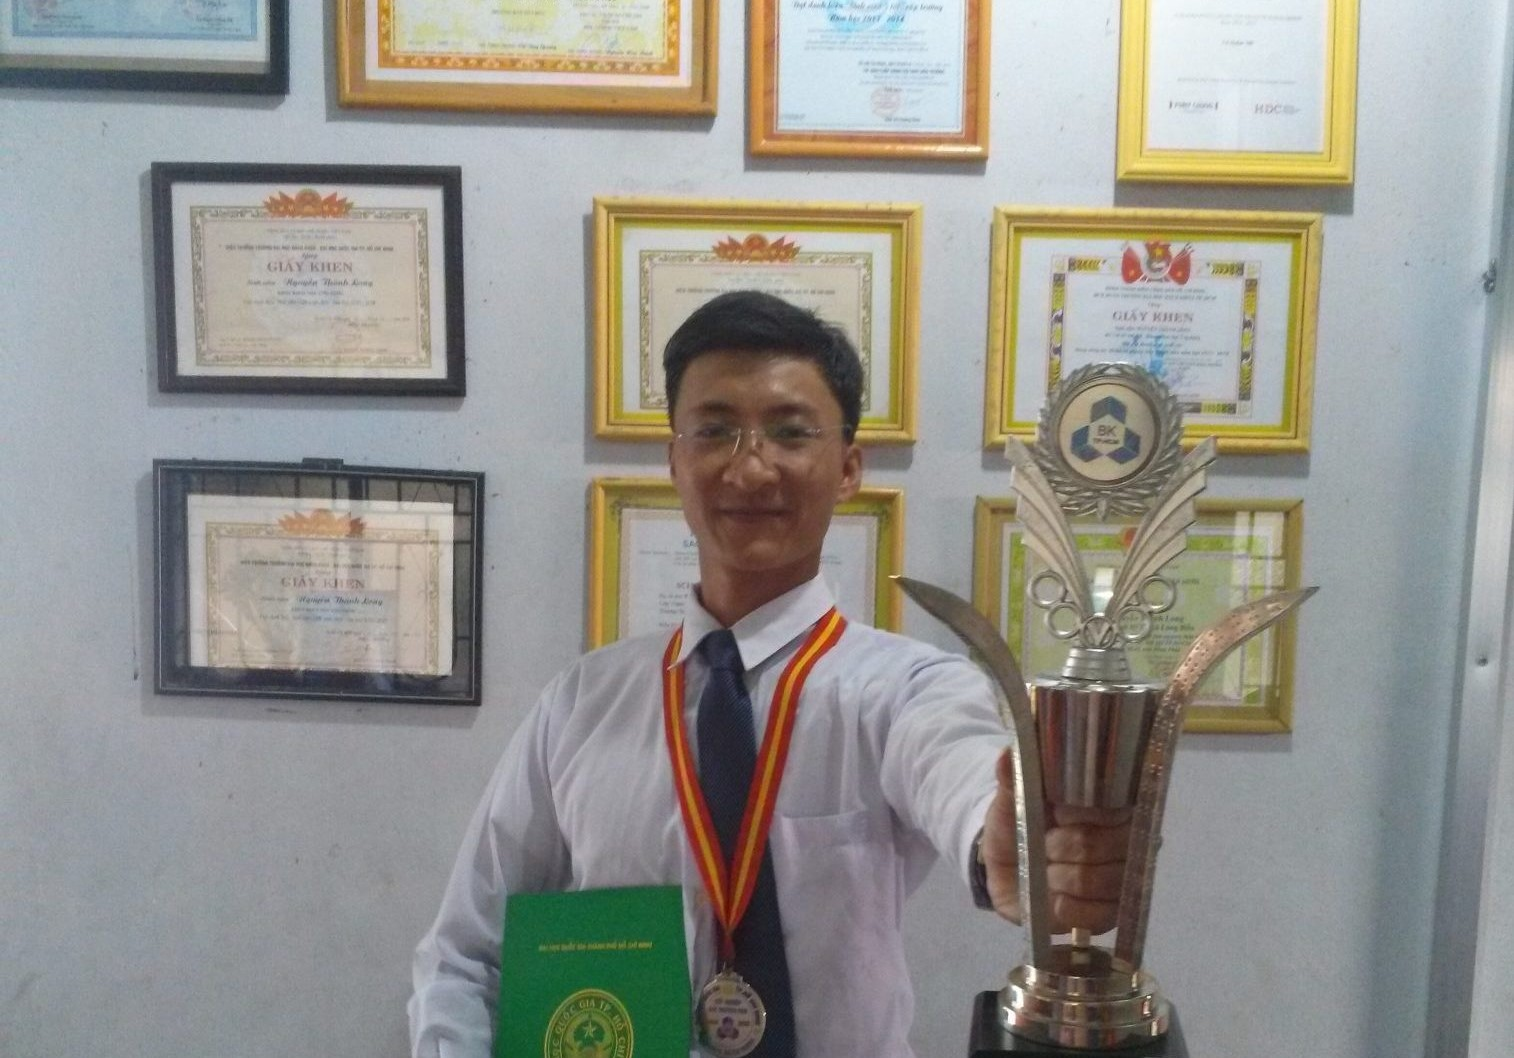 Student 01: Scholarship & Achievement